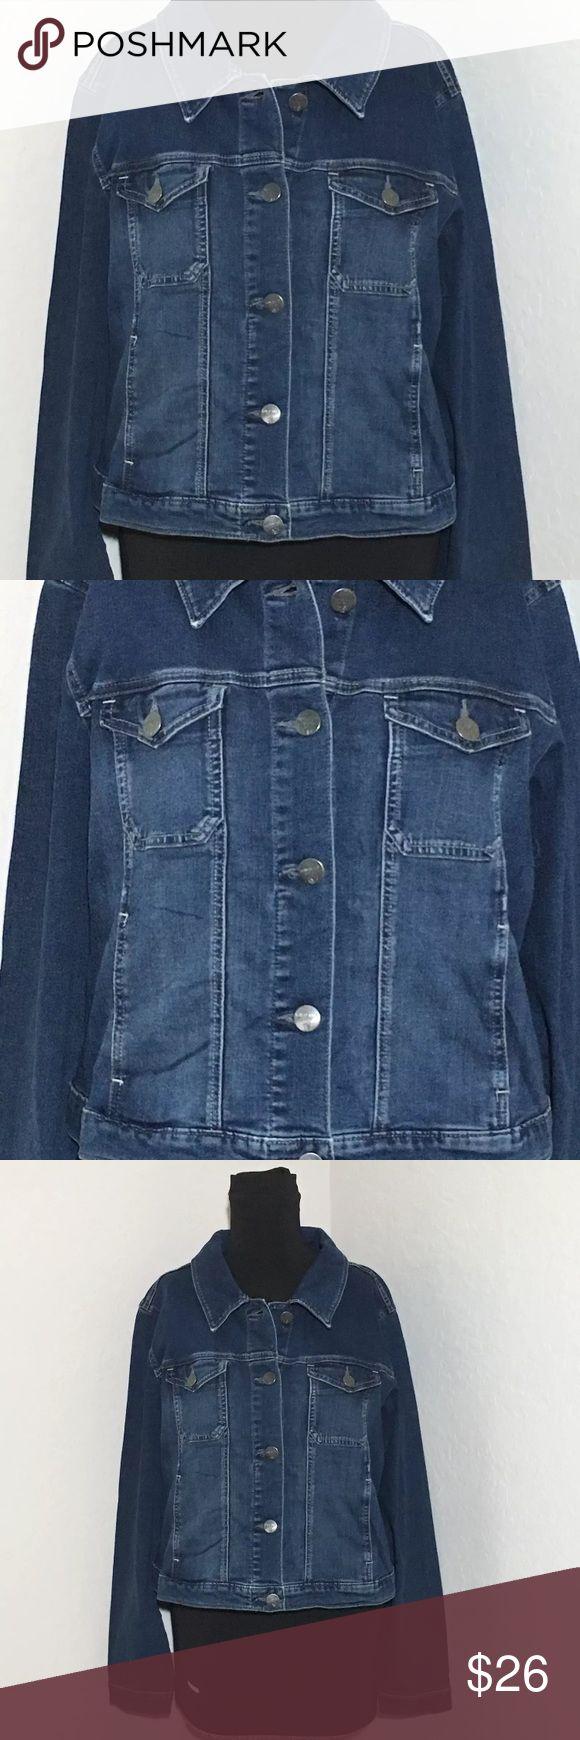 "Women's Kansas City Lee Jean Jacket Dark Wash XL Women's Kansas City Lee jean jacket dark wash. Size XL 23"" armpit to armpit, 20"" shoulder to hem, 25.5"" sleeve. Excellent condition no flaws Lee Jackets & Coats Jean Jackets"